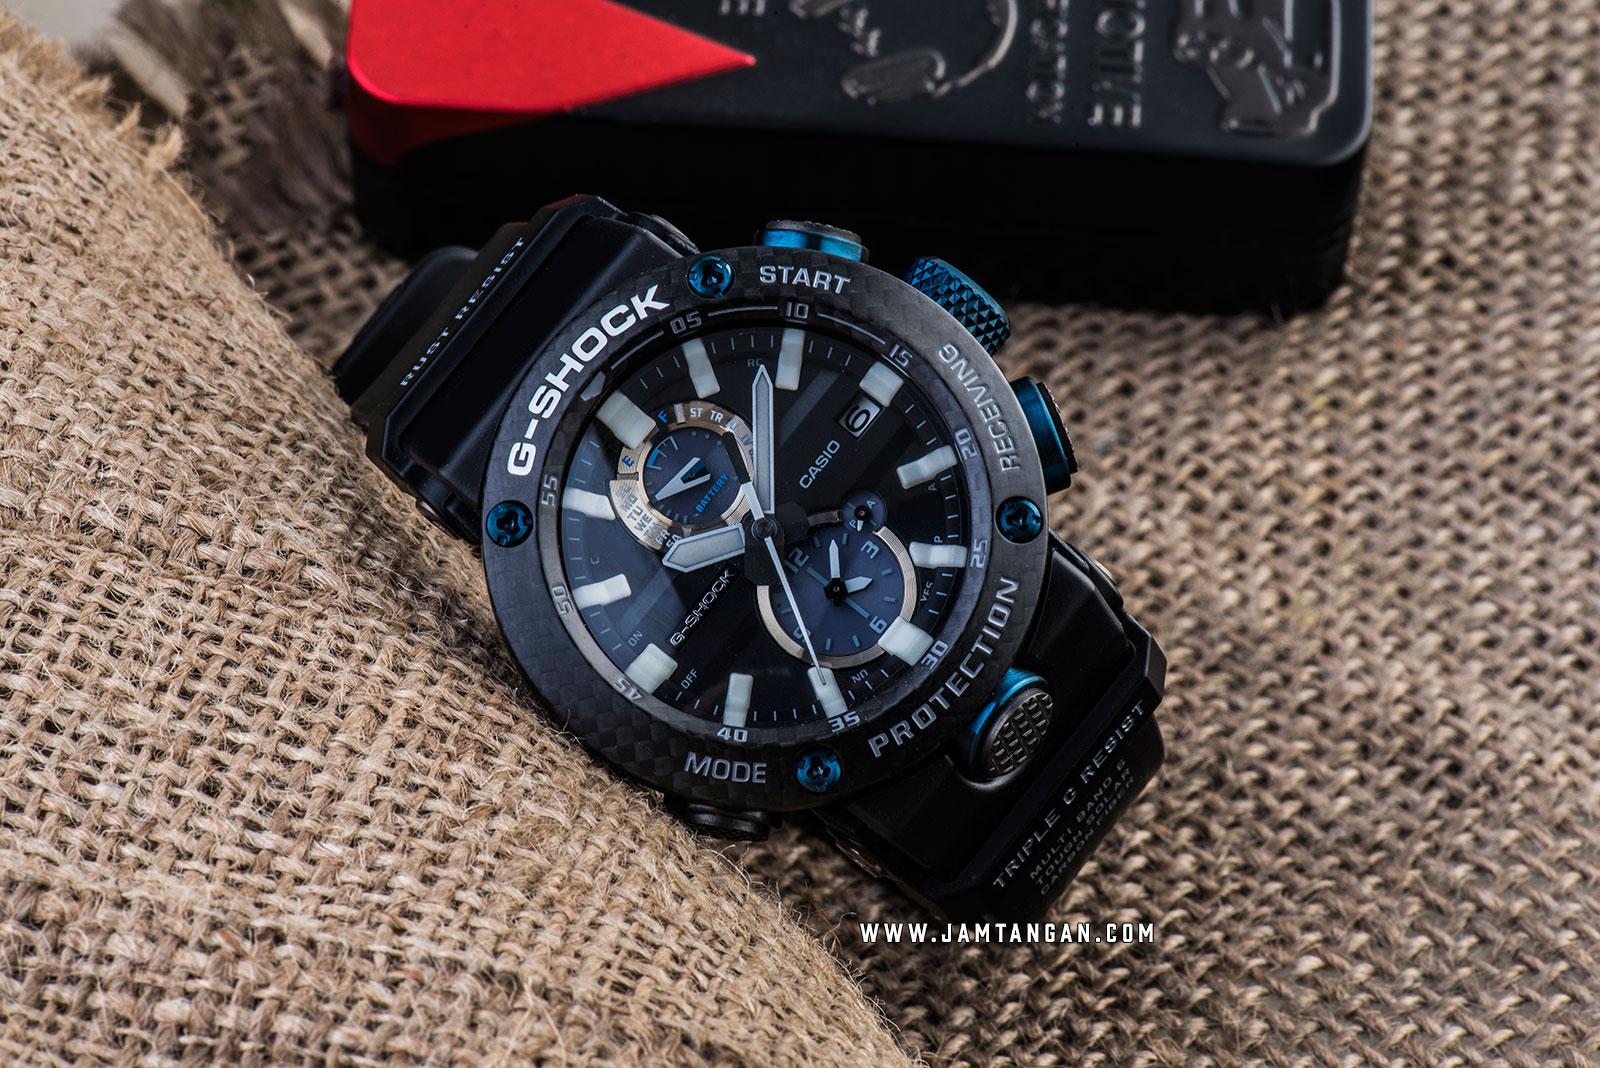 Casio G-Shock Gravitymaster GWR-B1000-1A1JF Black Analog Dial Black Resin Strap Machtwatch